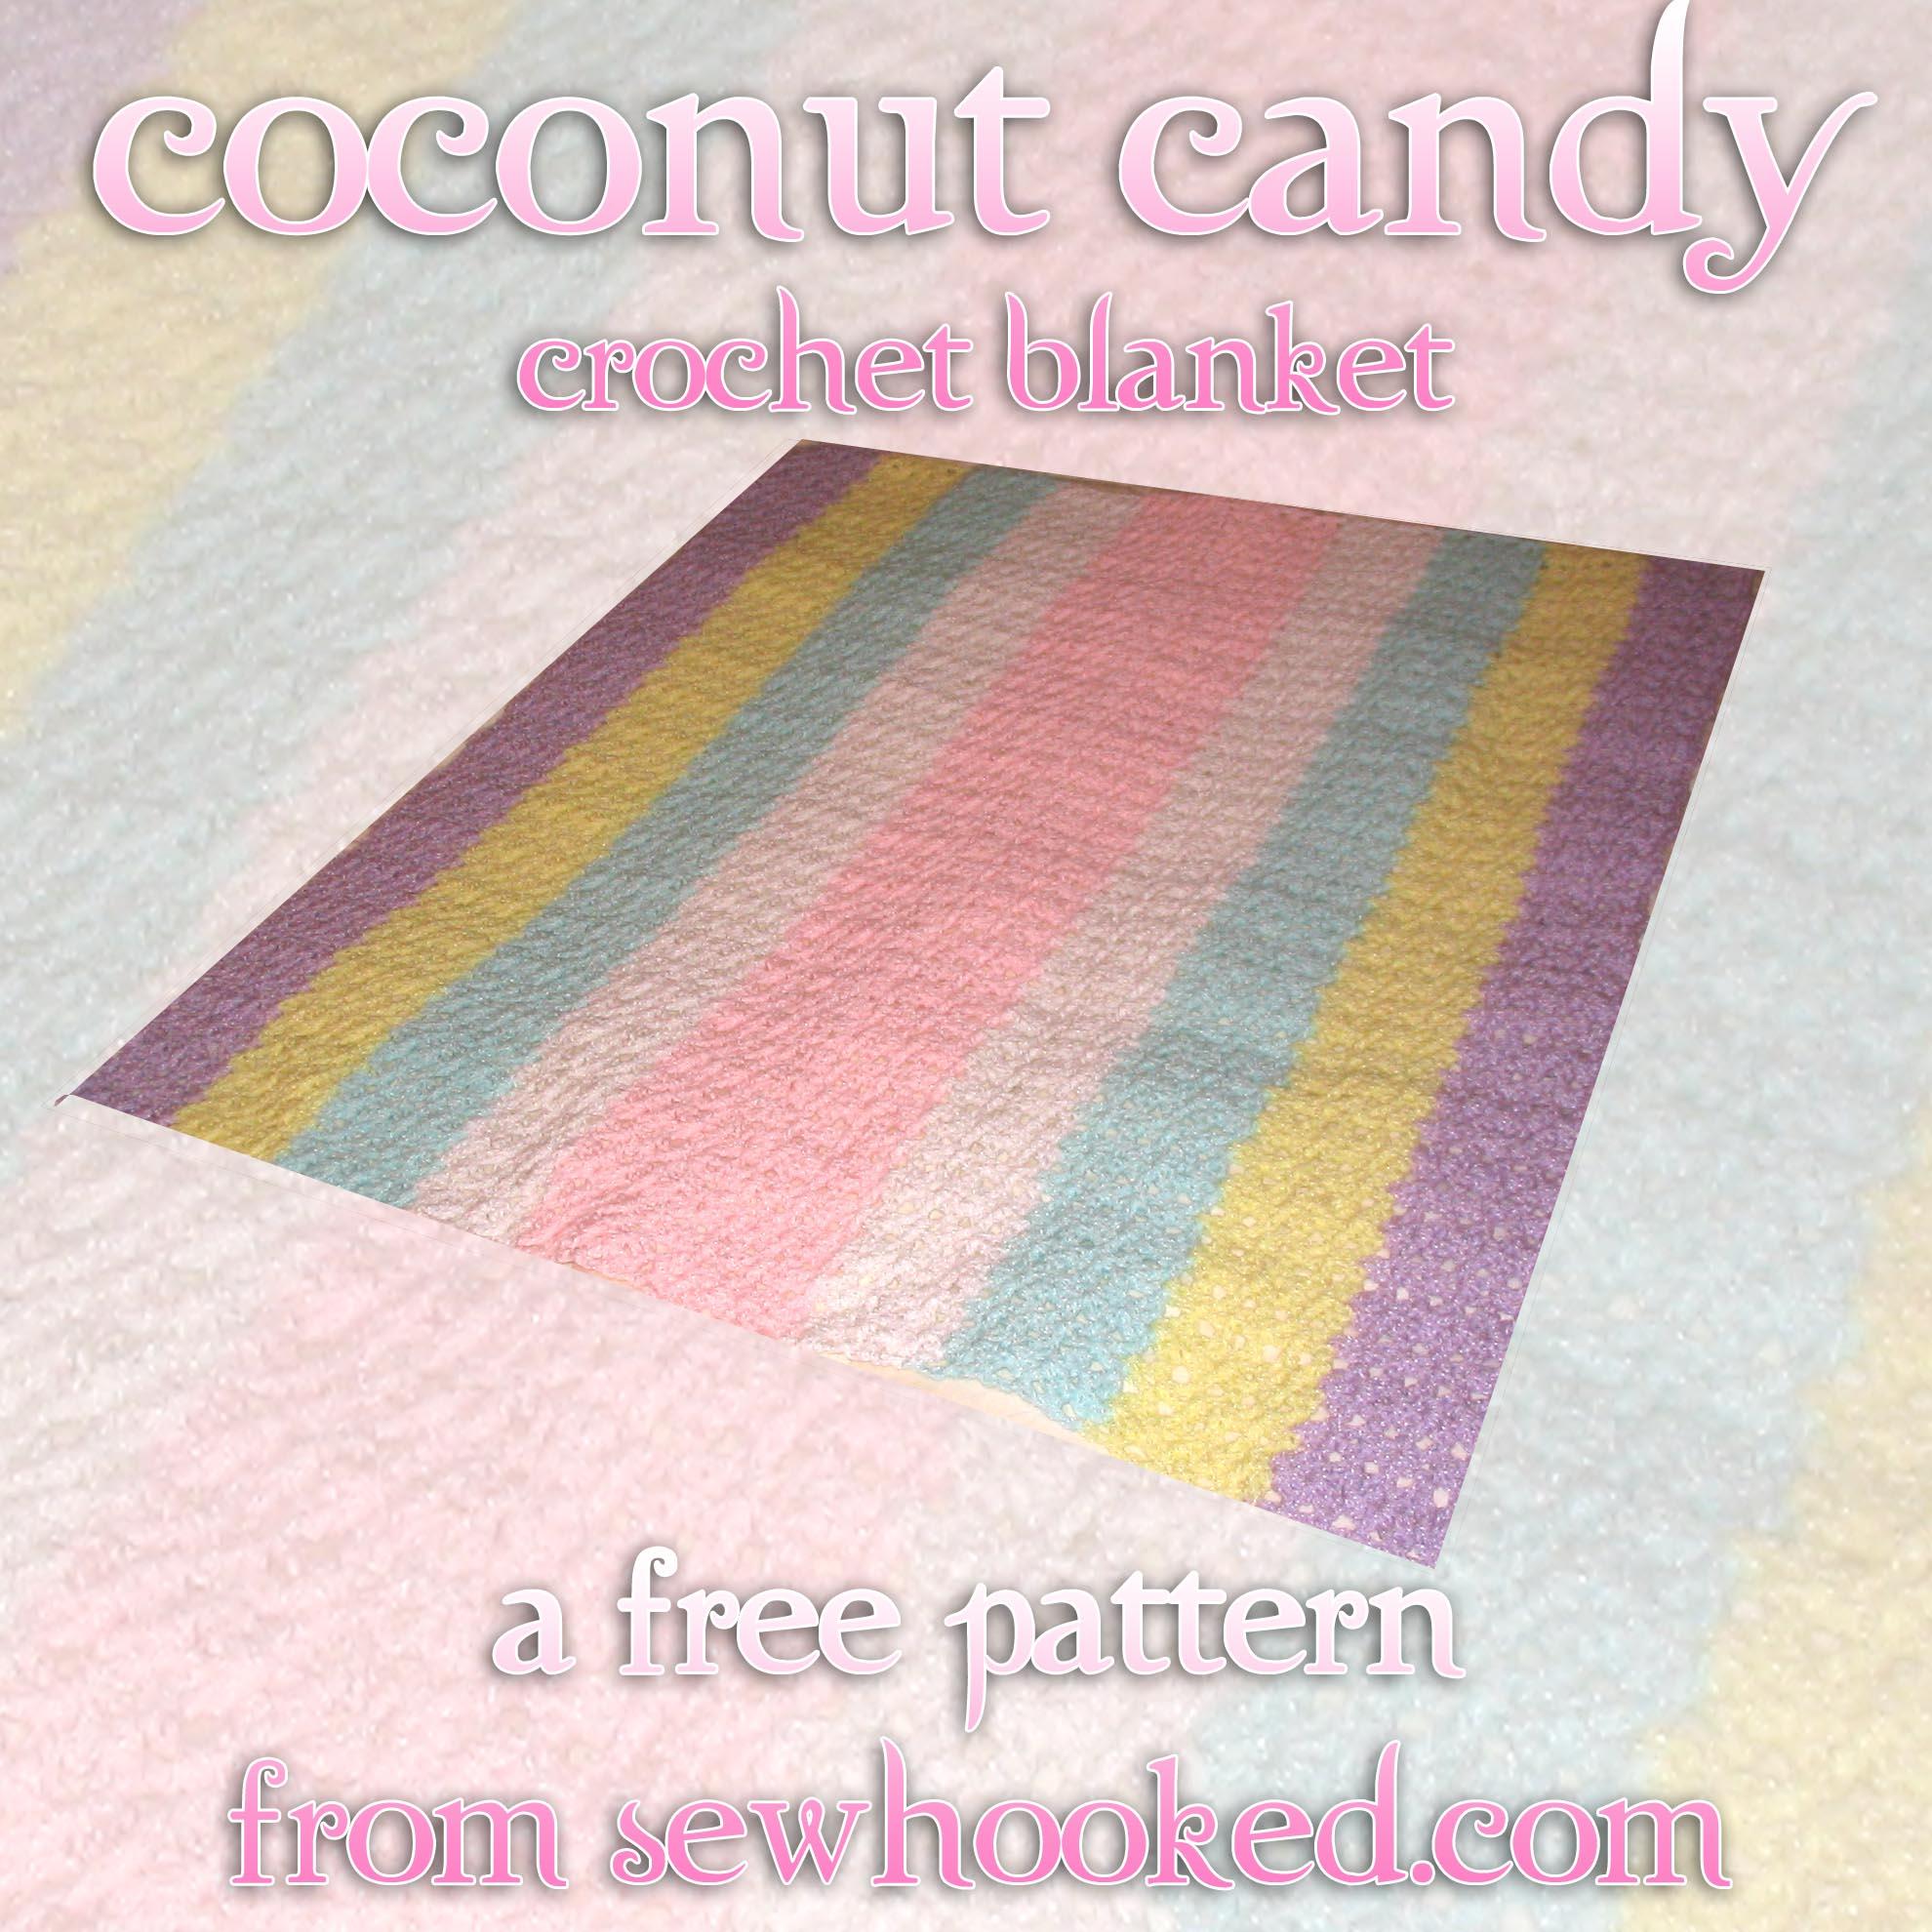 Coconut Candy Crochet 2005 title update